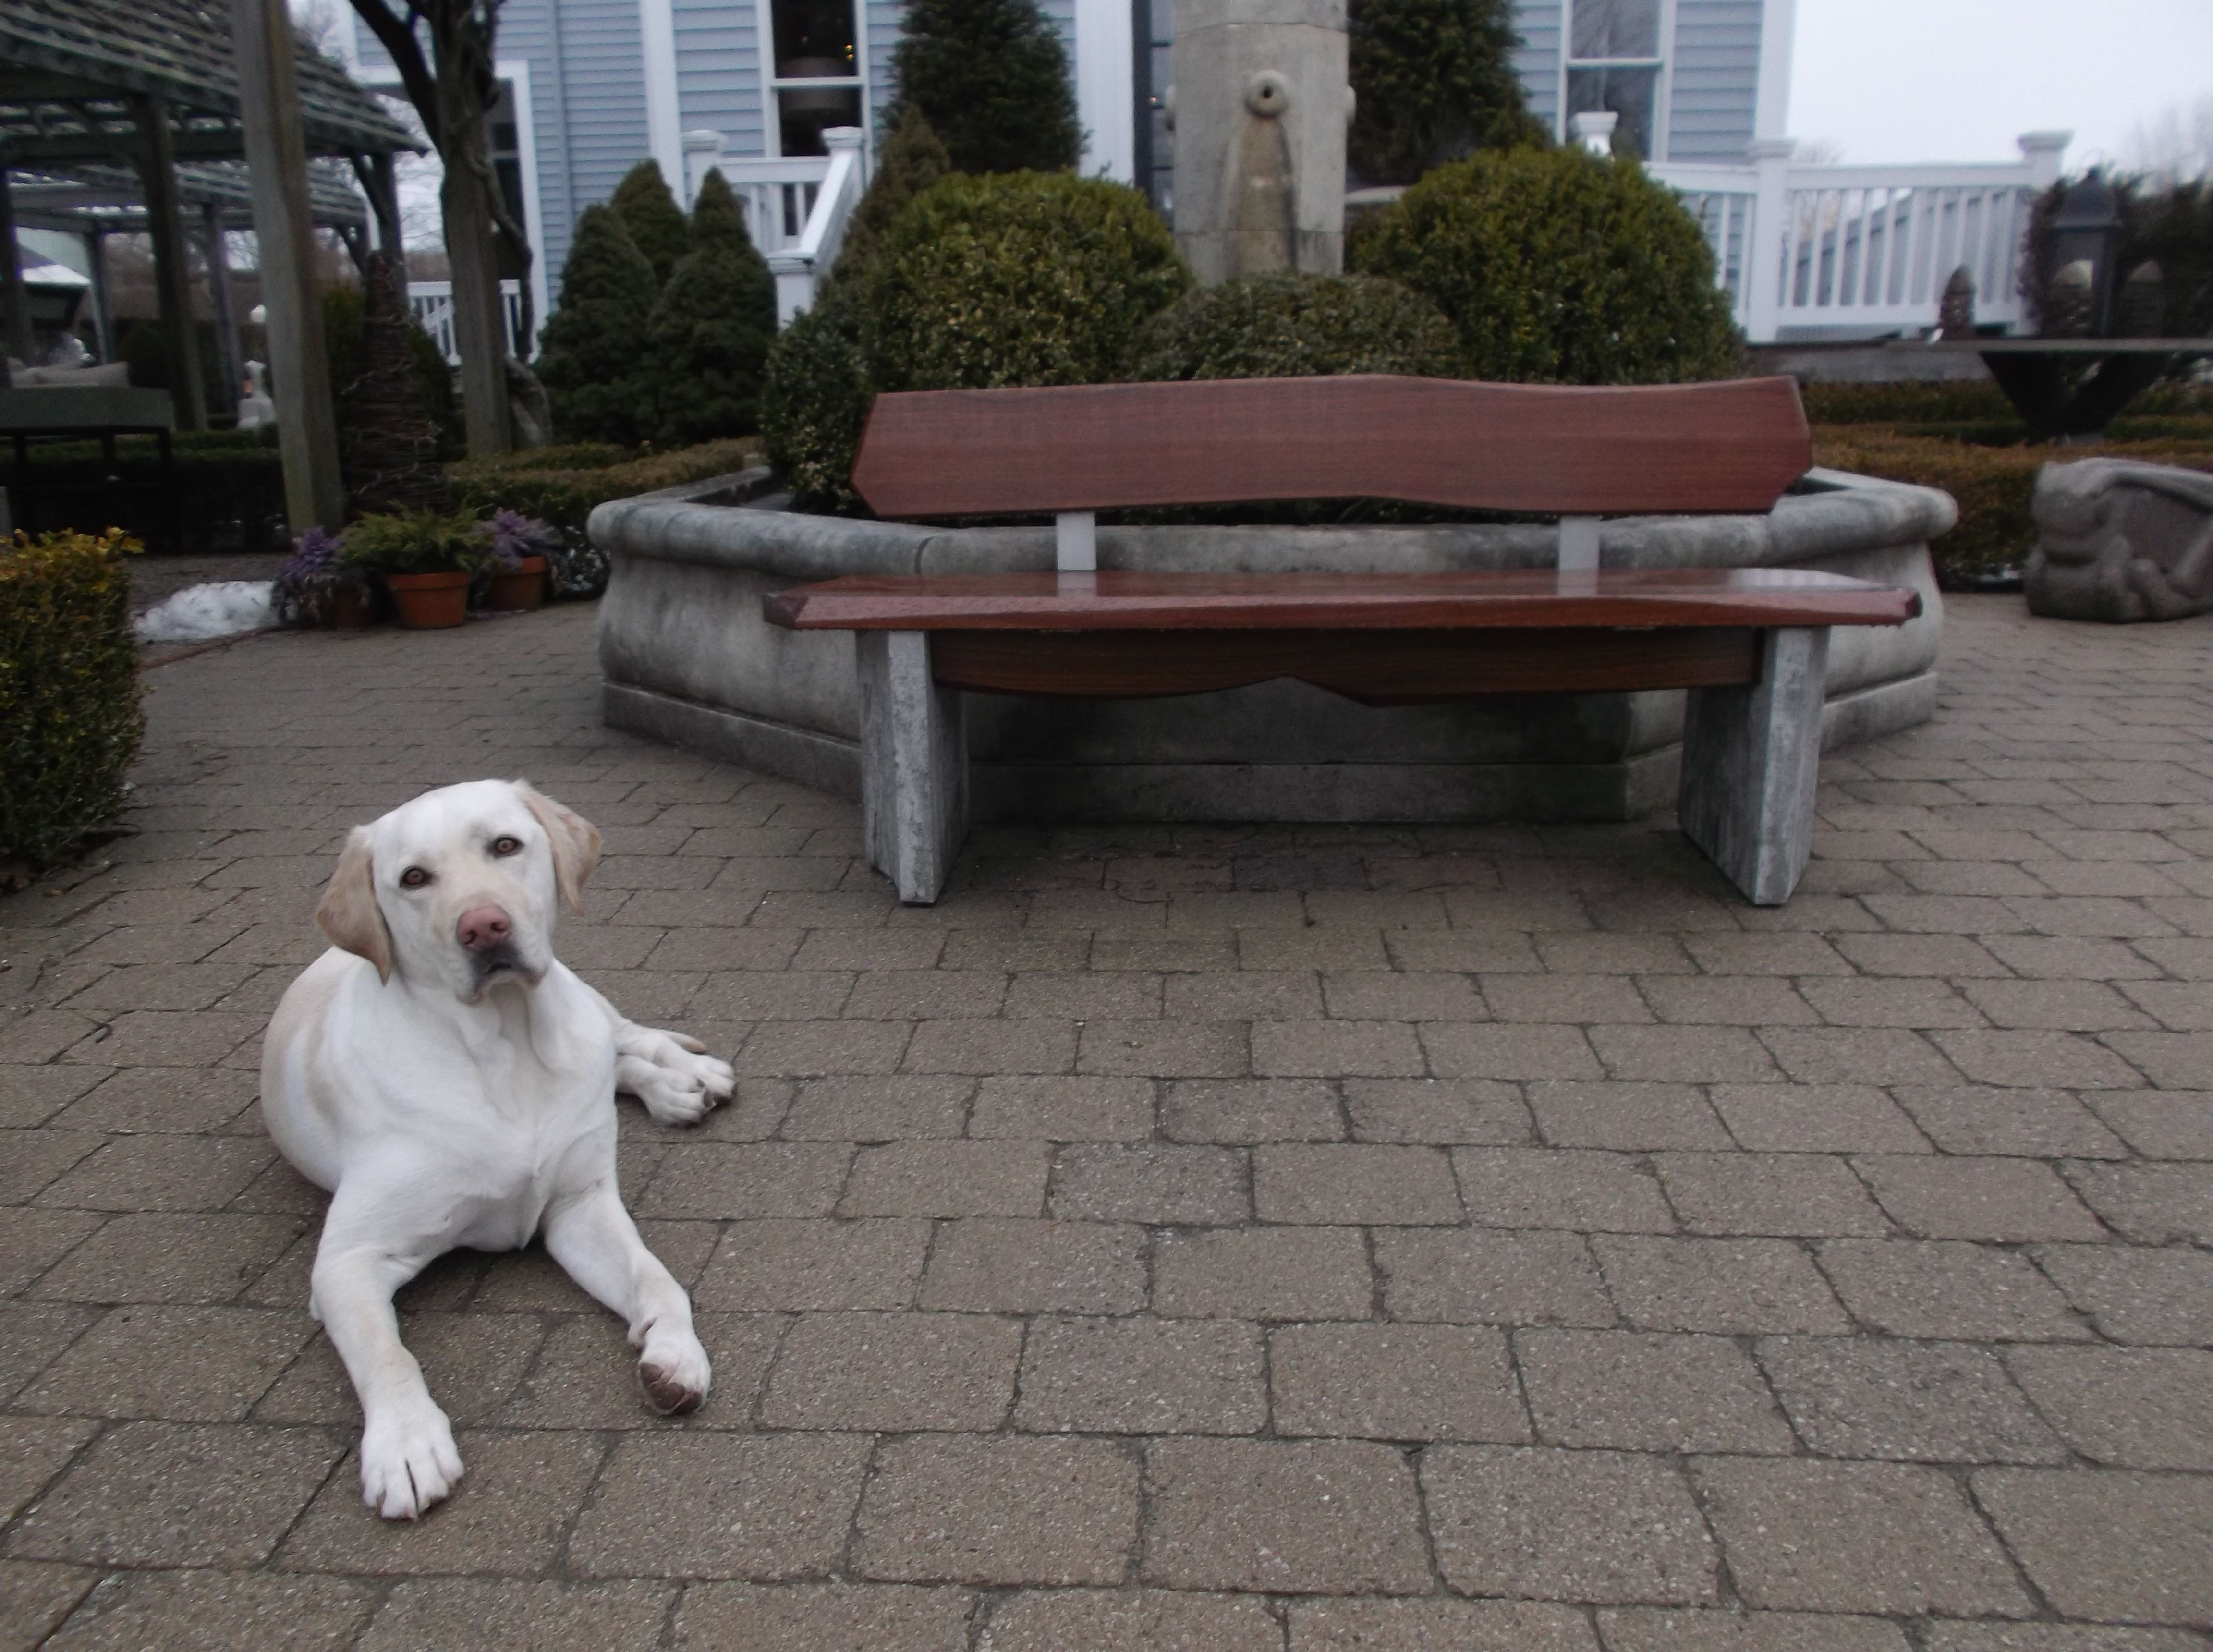 Astounding Adorable Ike Enhances This Southampton Garden Bench Evergreenethics Interior Chair Design Evergreenethicsorg